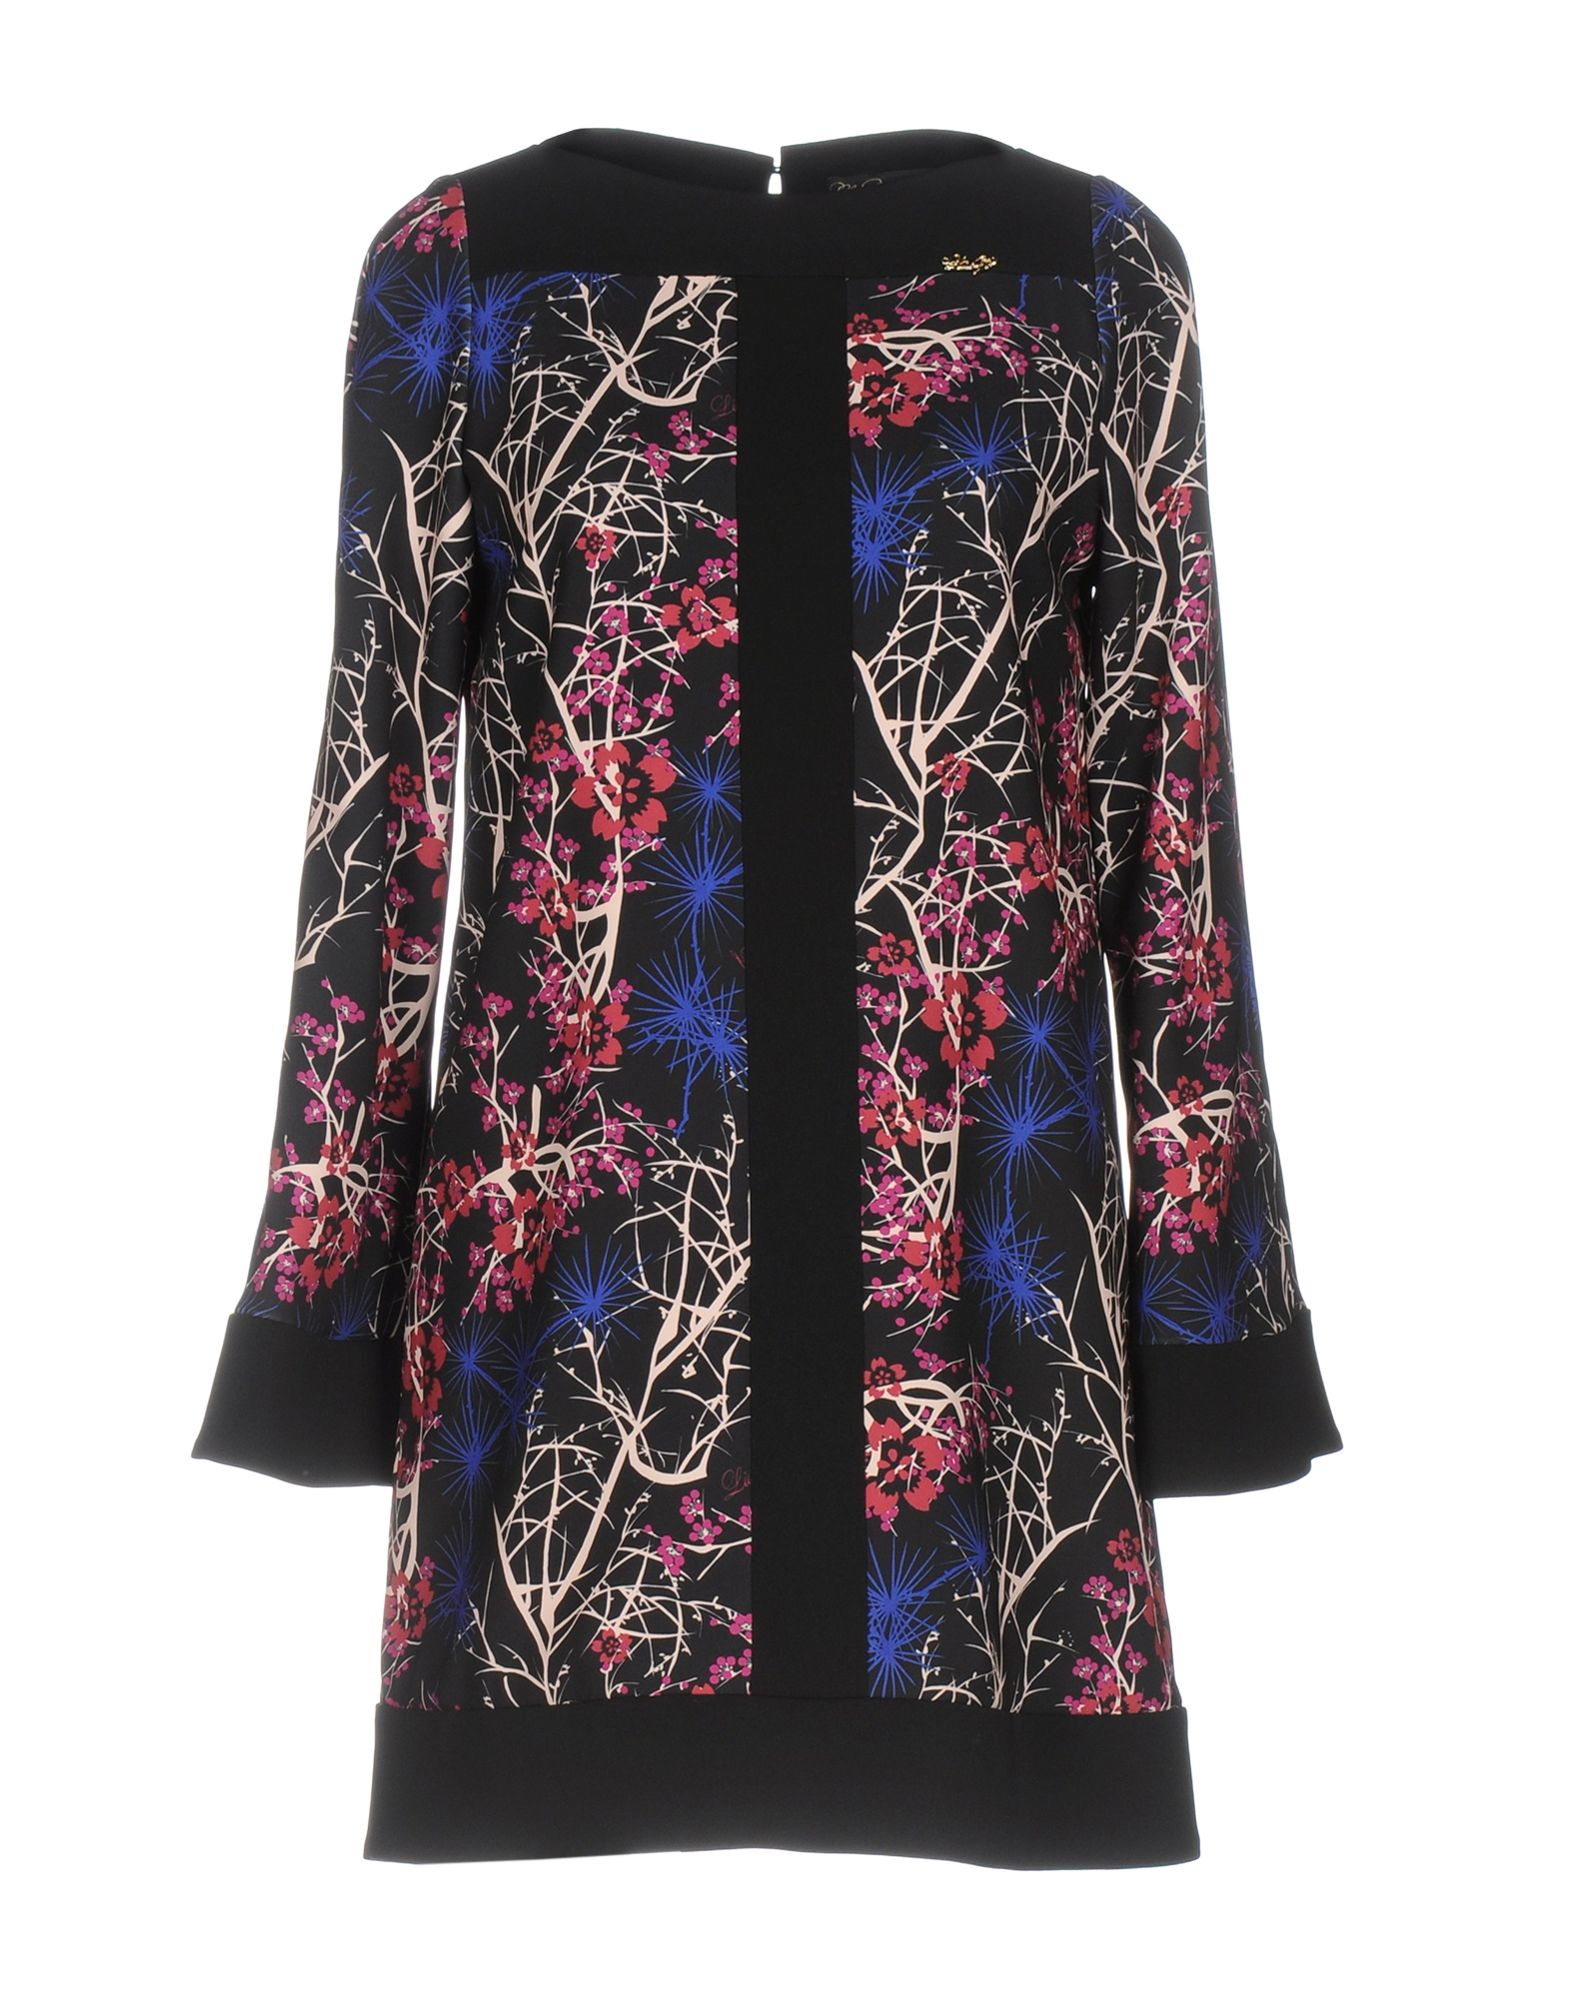 LES COCKTAILS DE LIU •JO Damen Kurzes Kleid Farbe Schwarz Größe 4